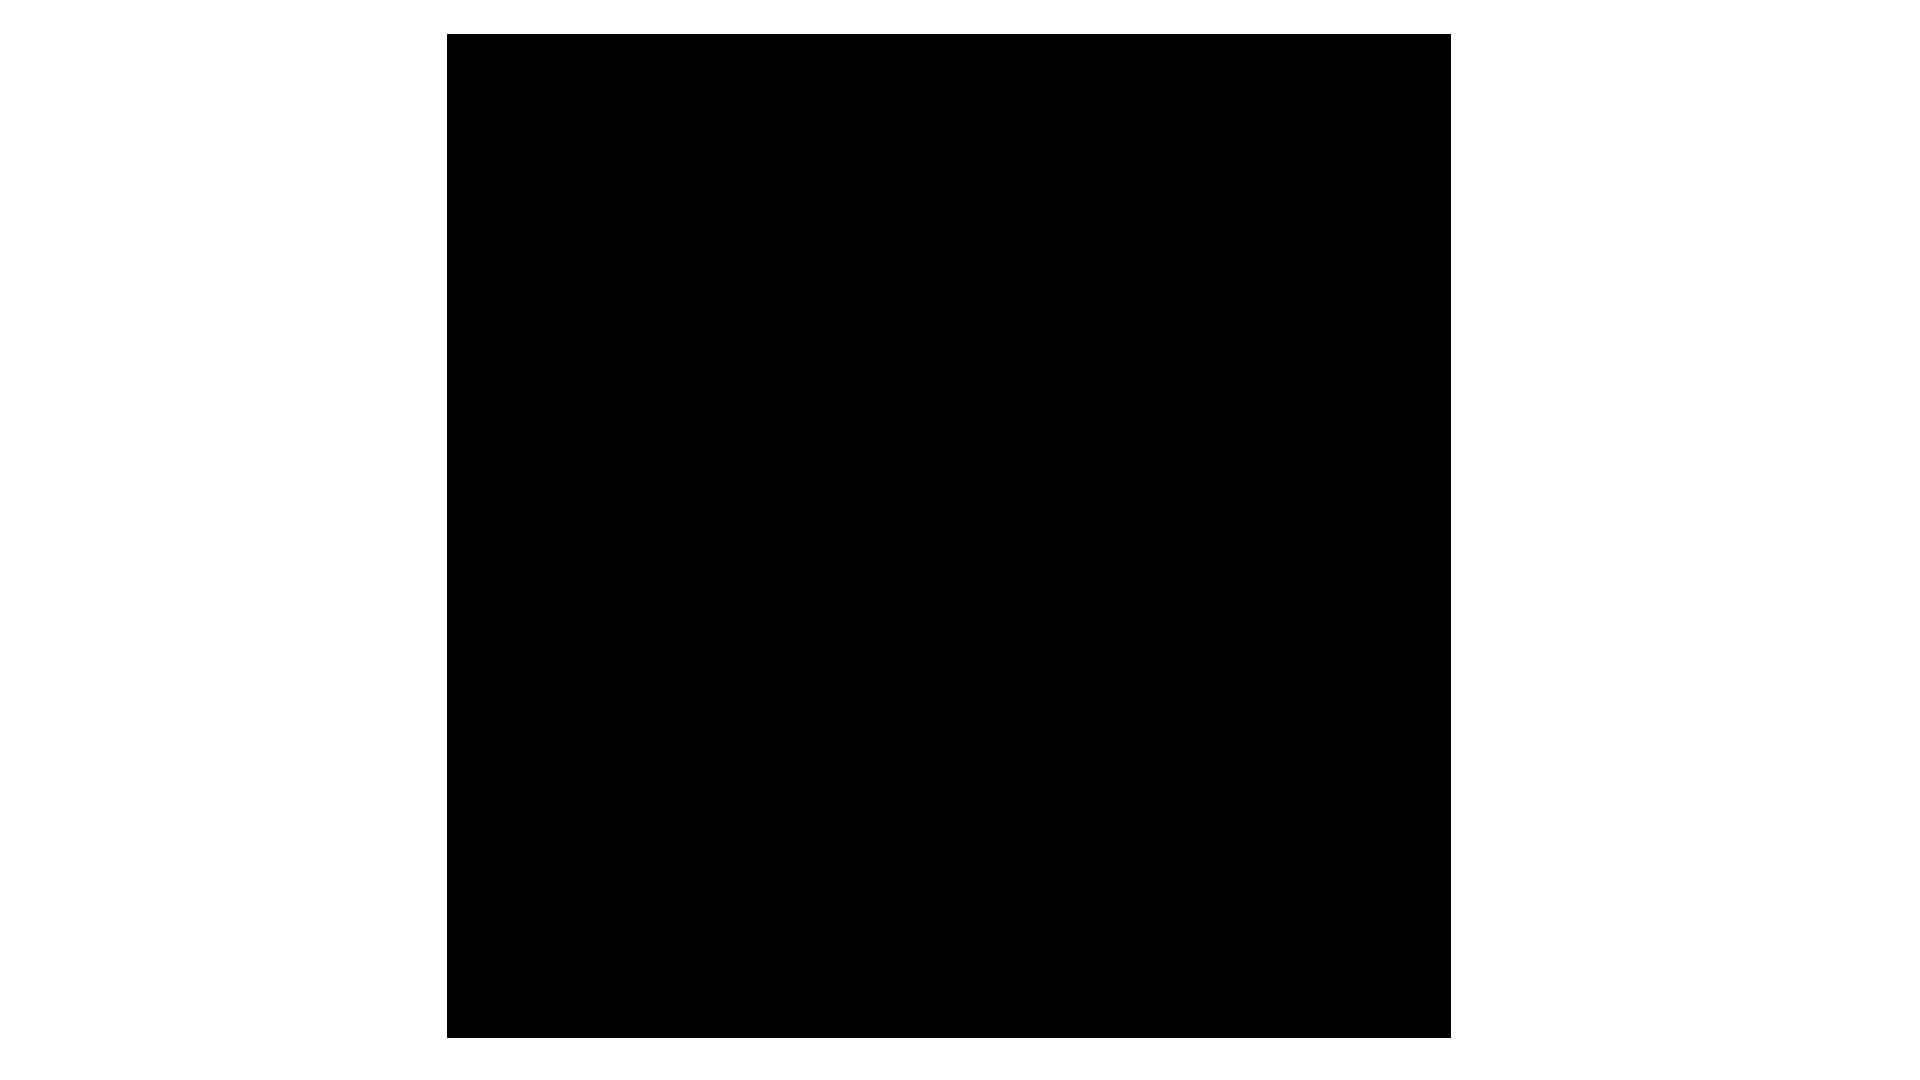 Meaning GitHub logo and symbol.